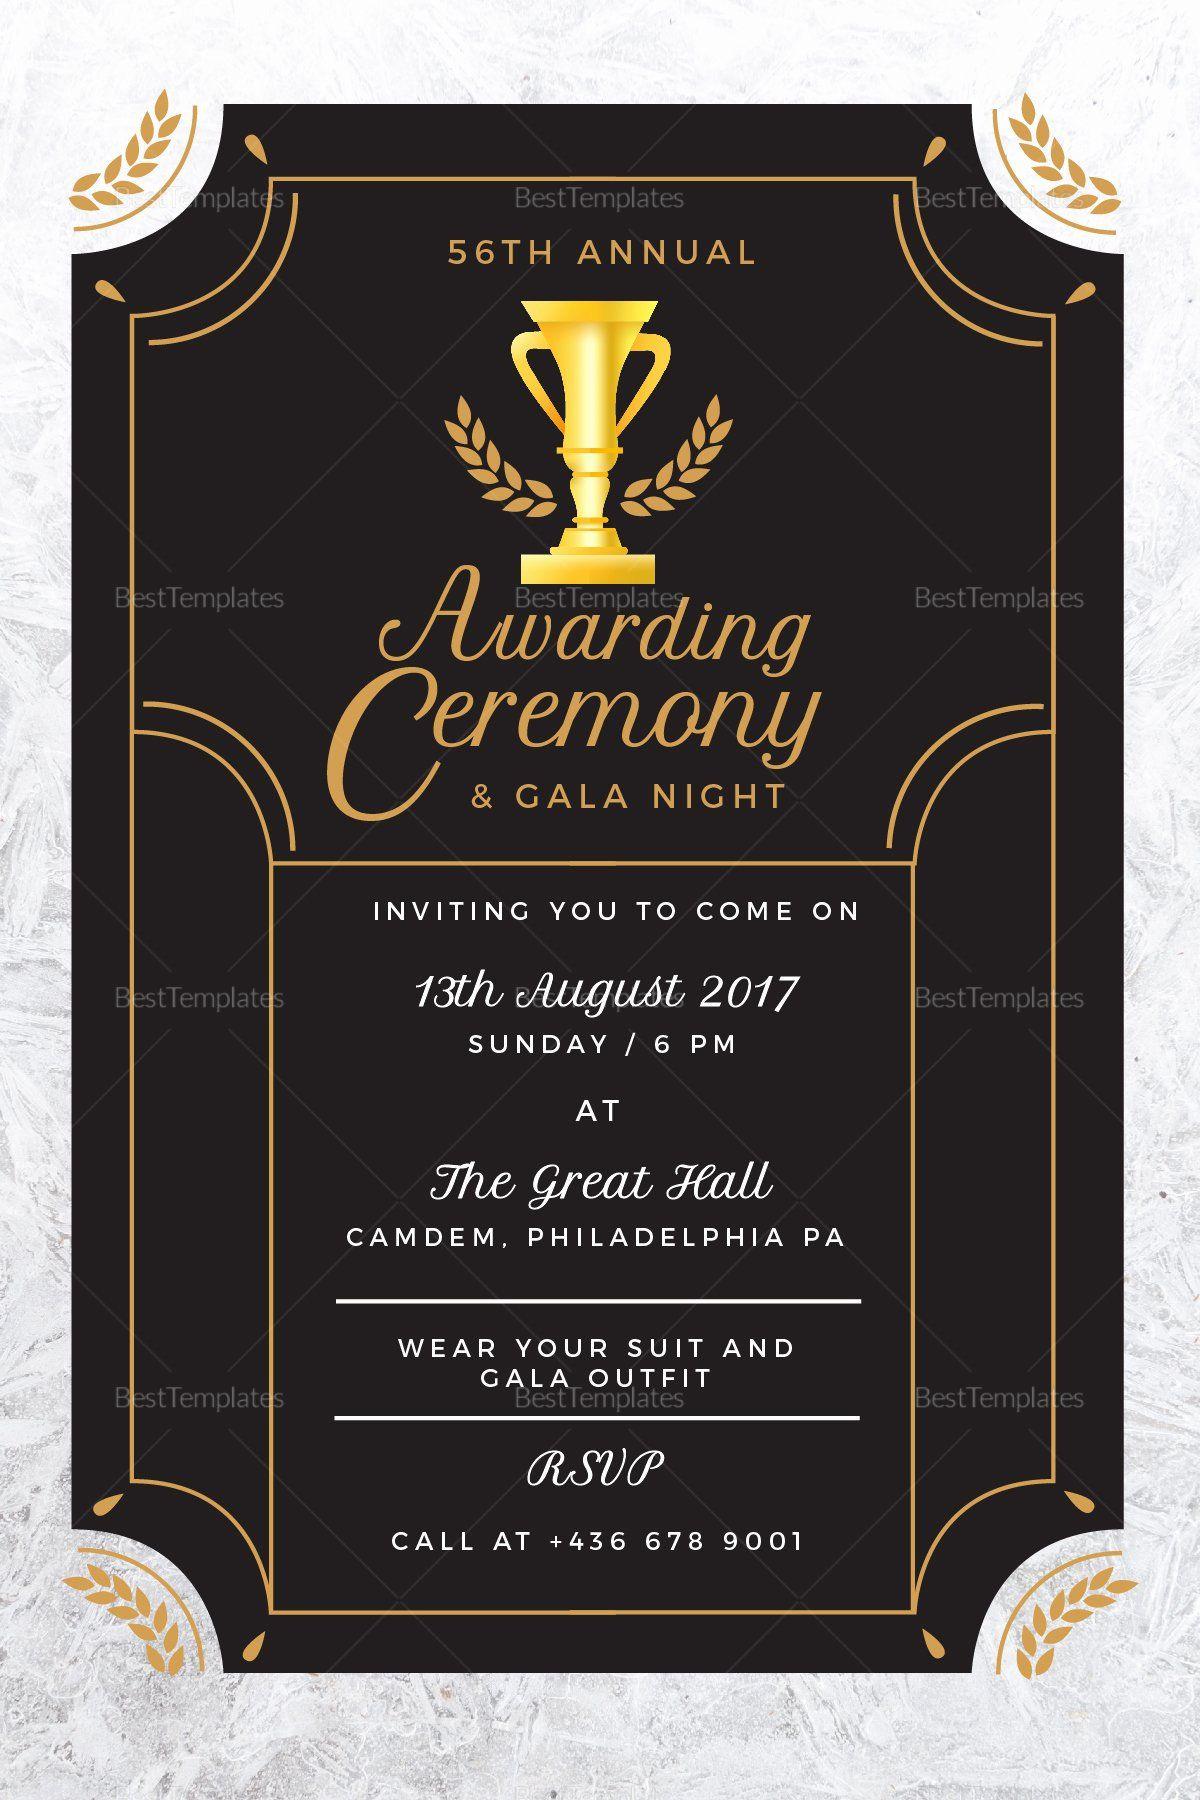 Best Program To Make Invitations Luxury Annual Award Ceremony Invitation Design Template Ceremony Invitation Invitation Template Printable Invitation Templates